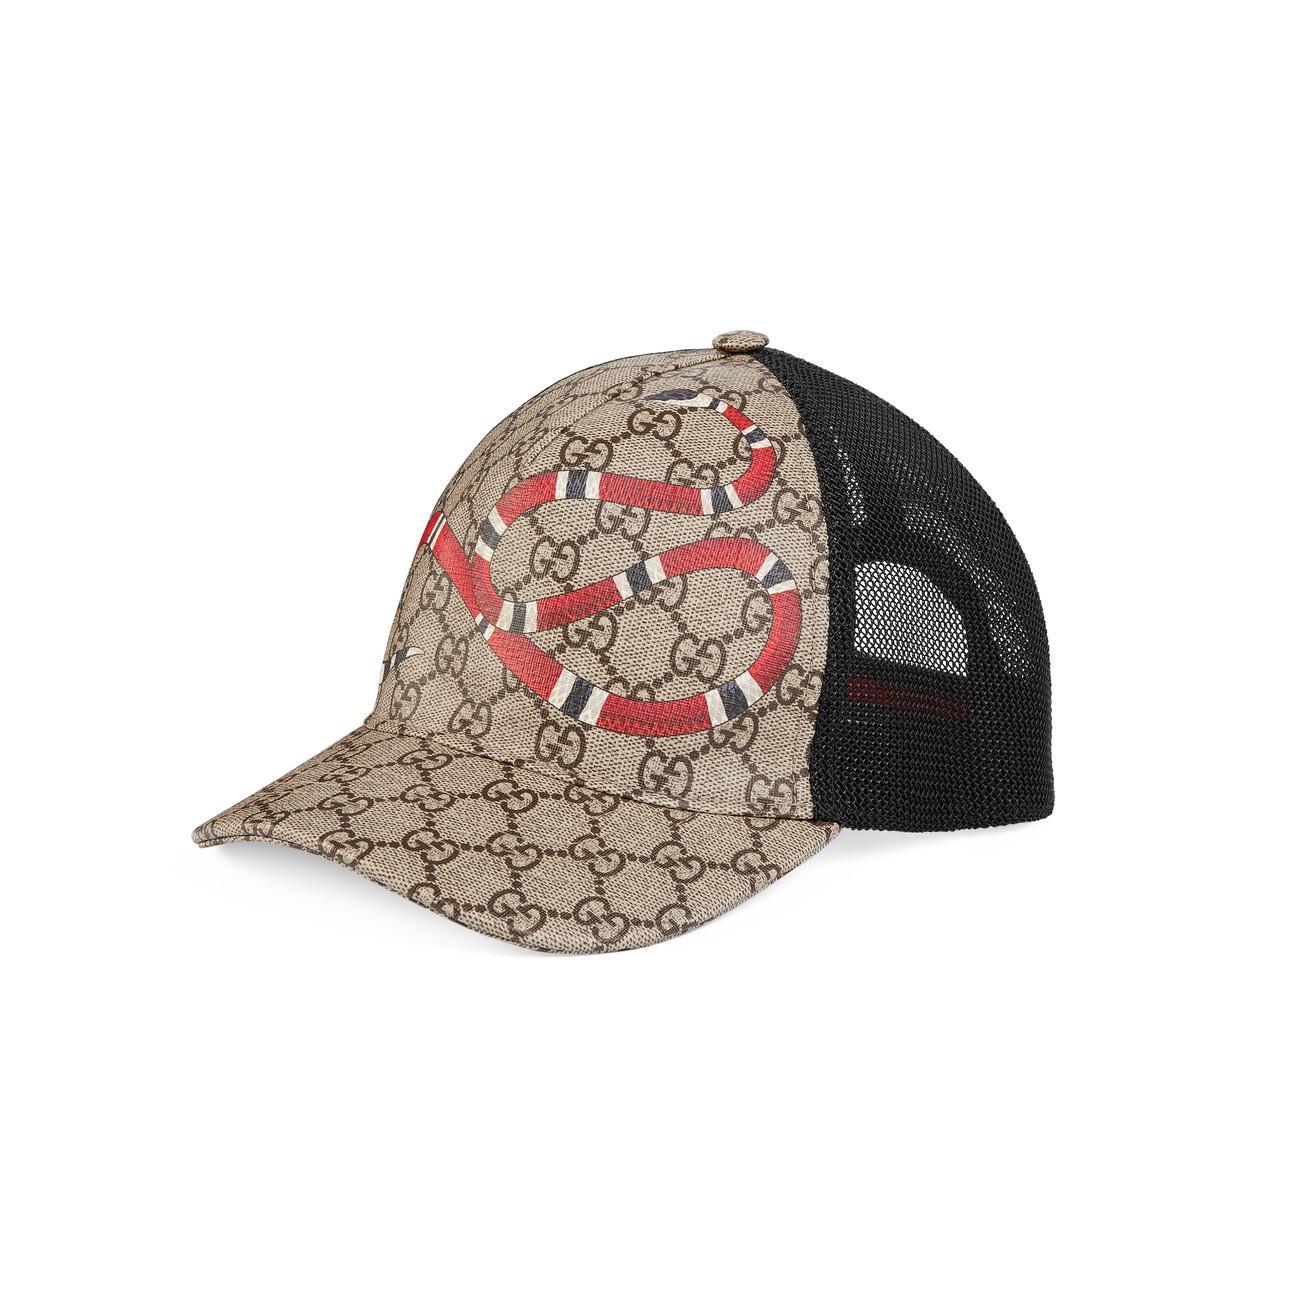 9c9408b750e0d Gucci Snake Print Gg Supreme Baseball Hat for Men - Save 42% - Lyst